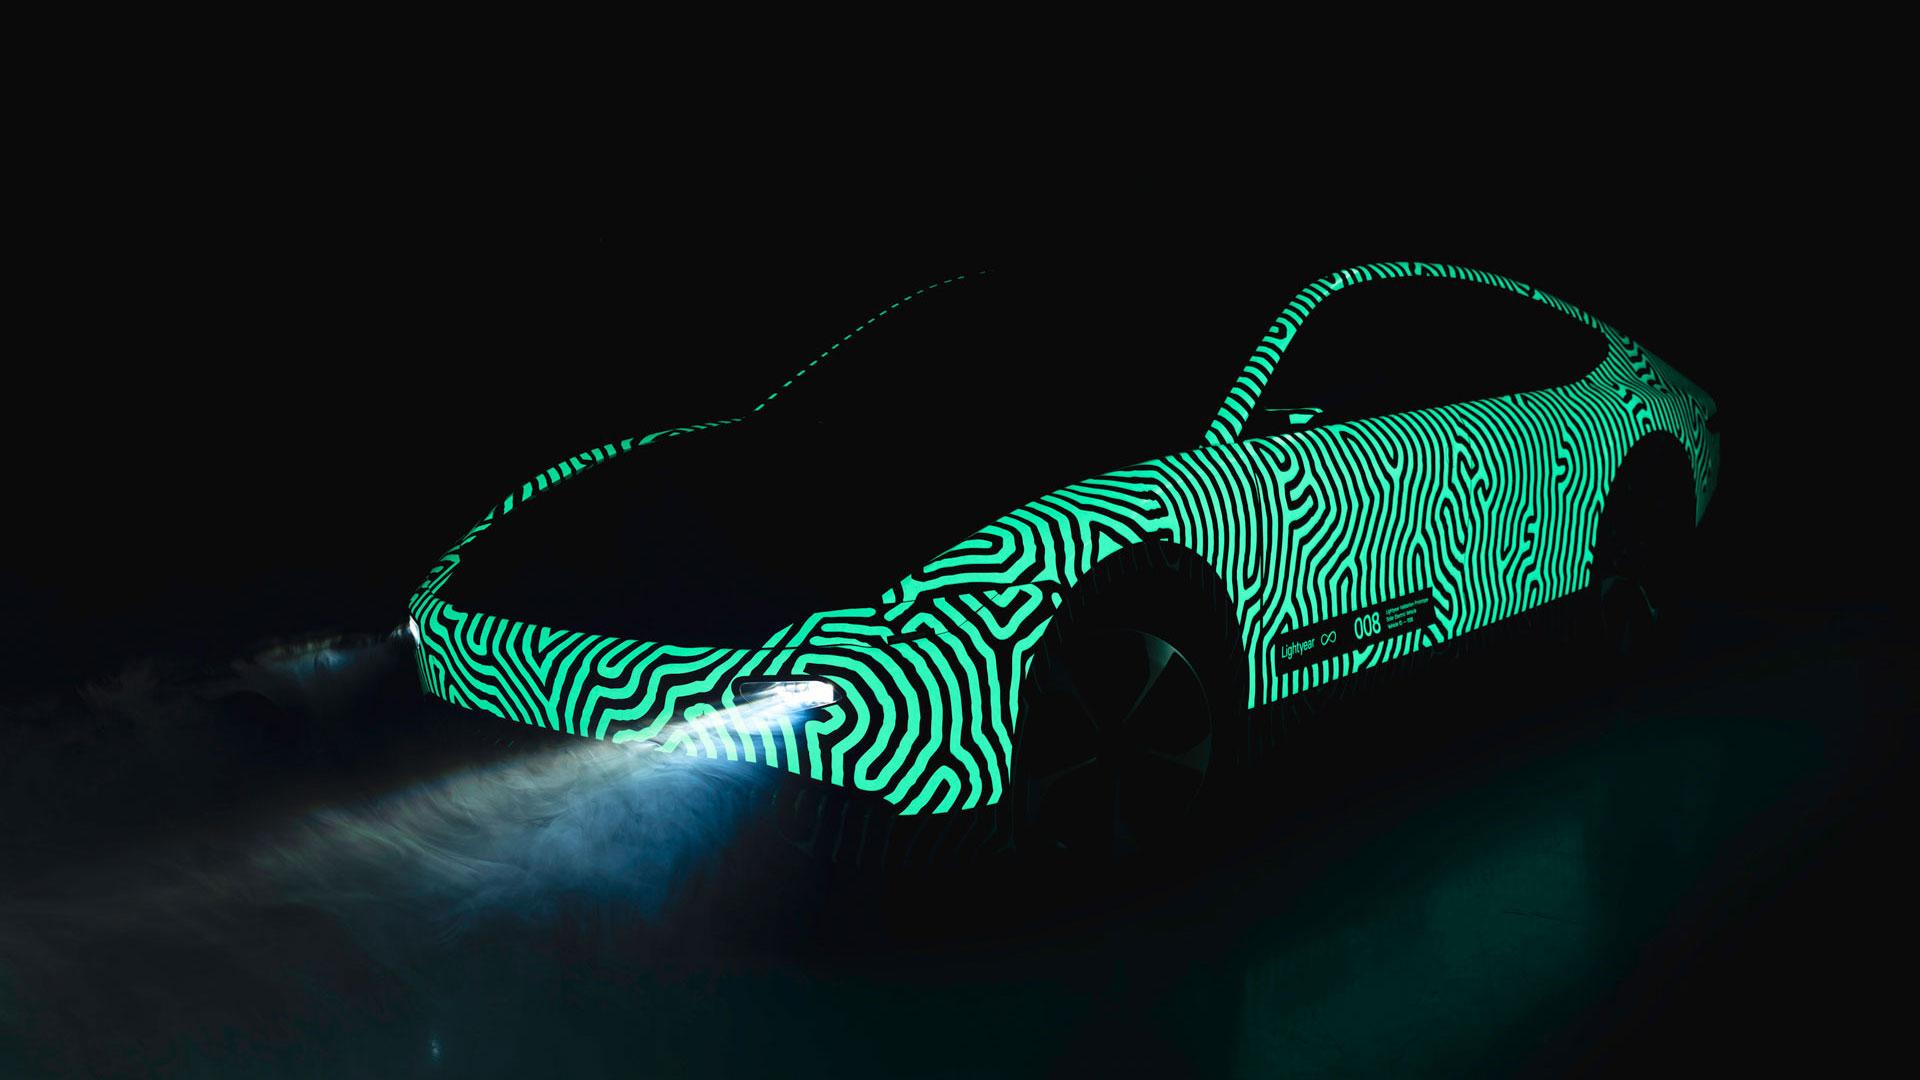 Lightyear's prototype glow-in-the-dark